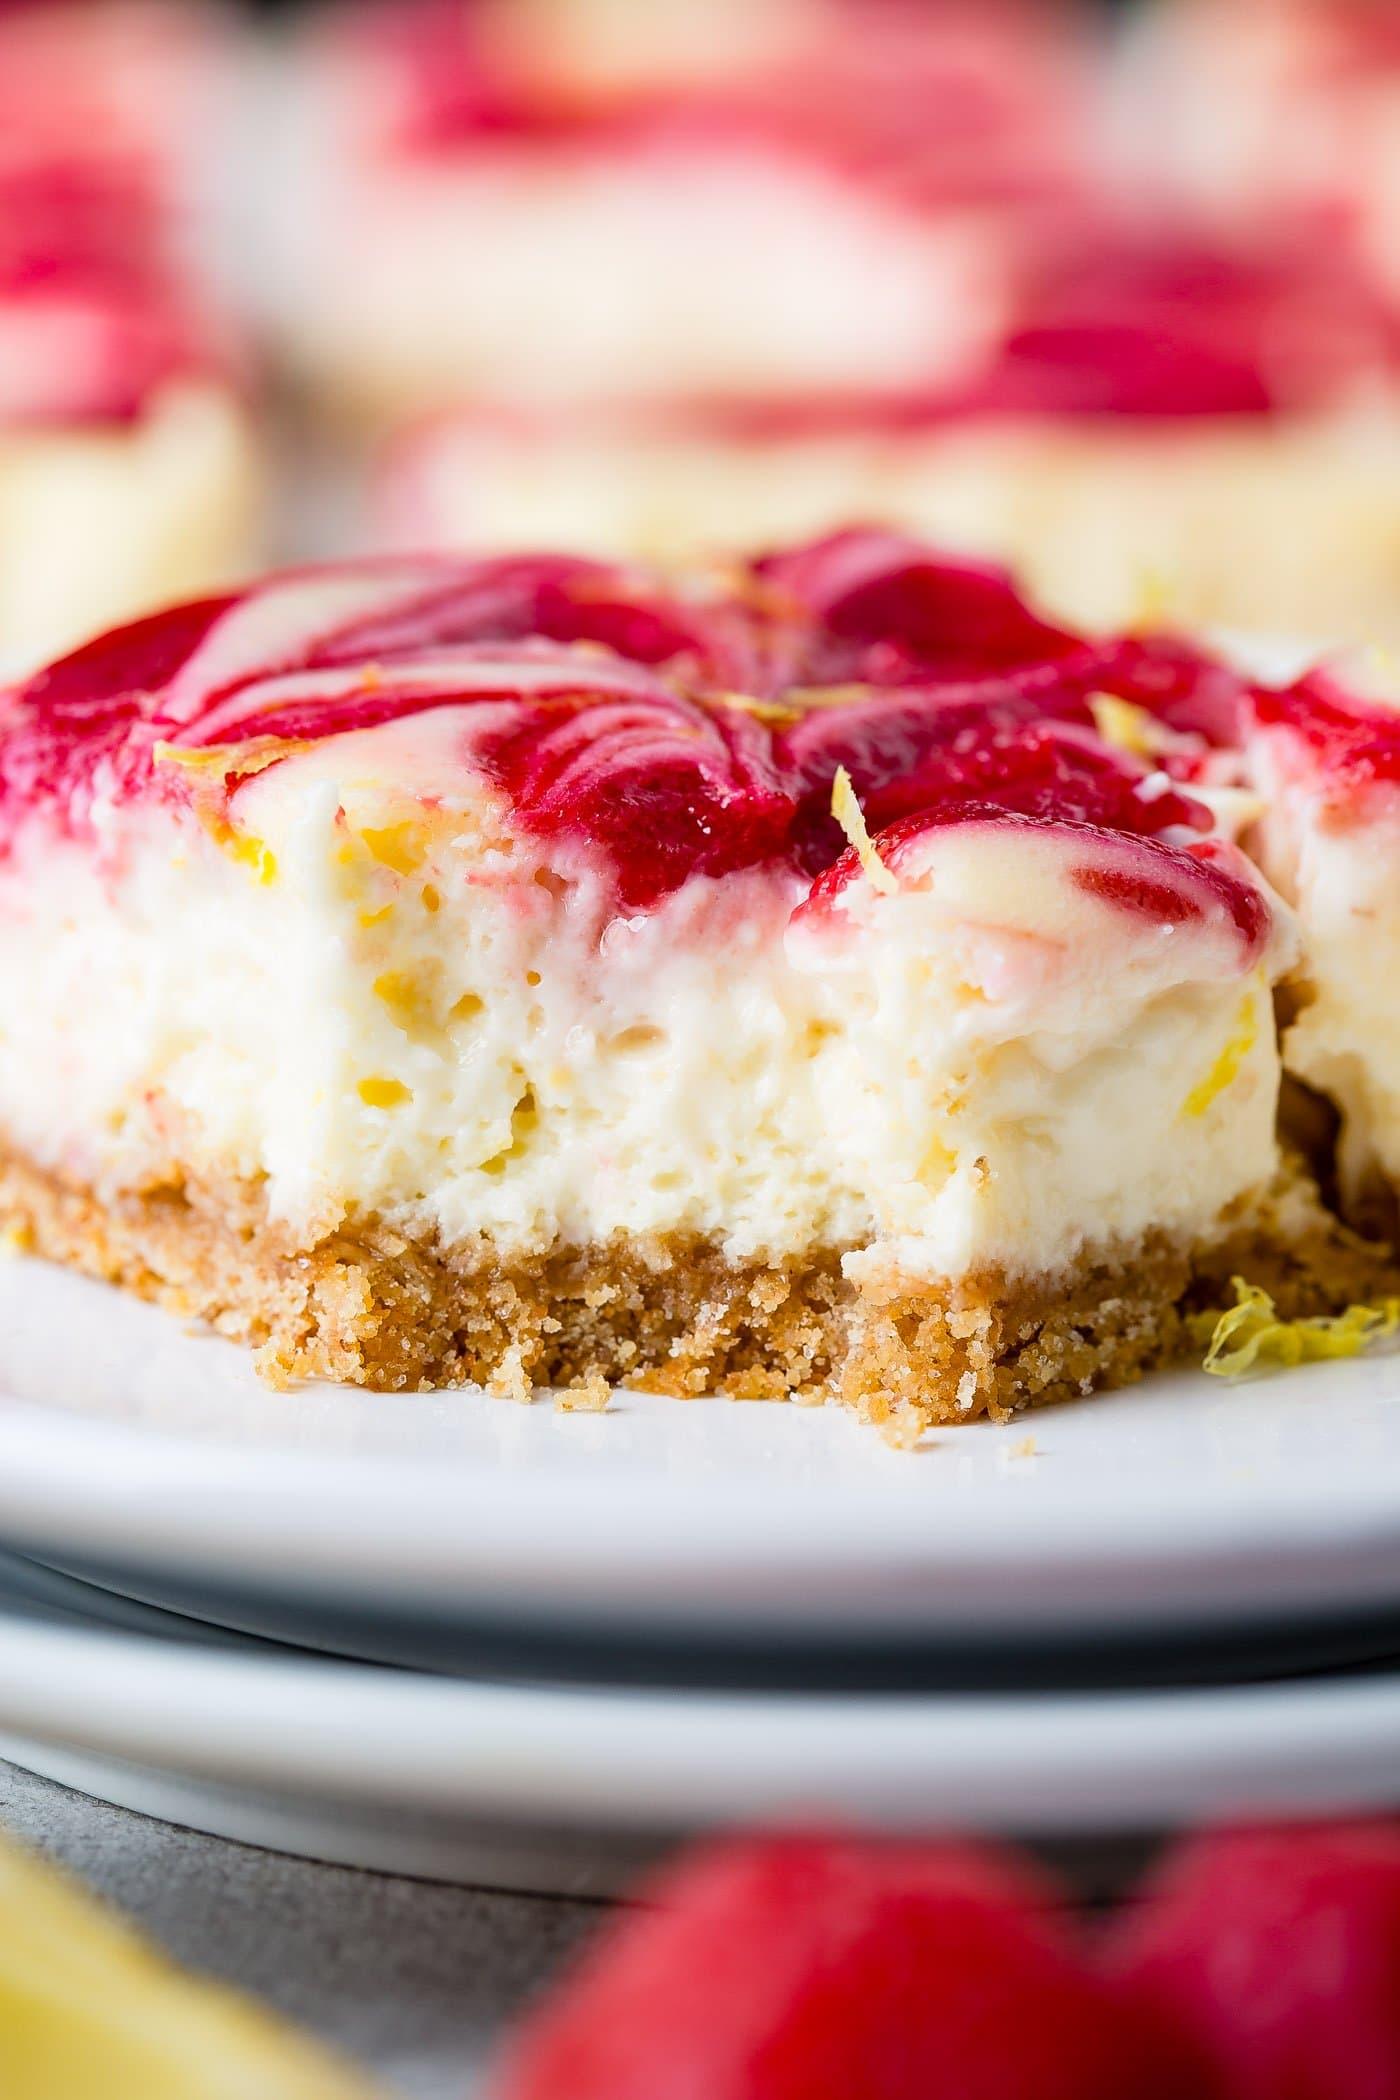 A close-up of a swirled raspberry lemon cheesecake bar. the top has raspberry sauce swirled in.